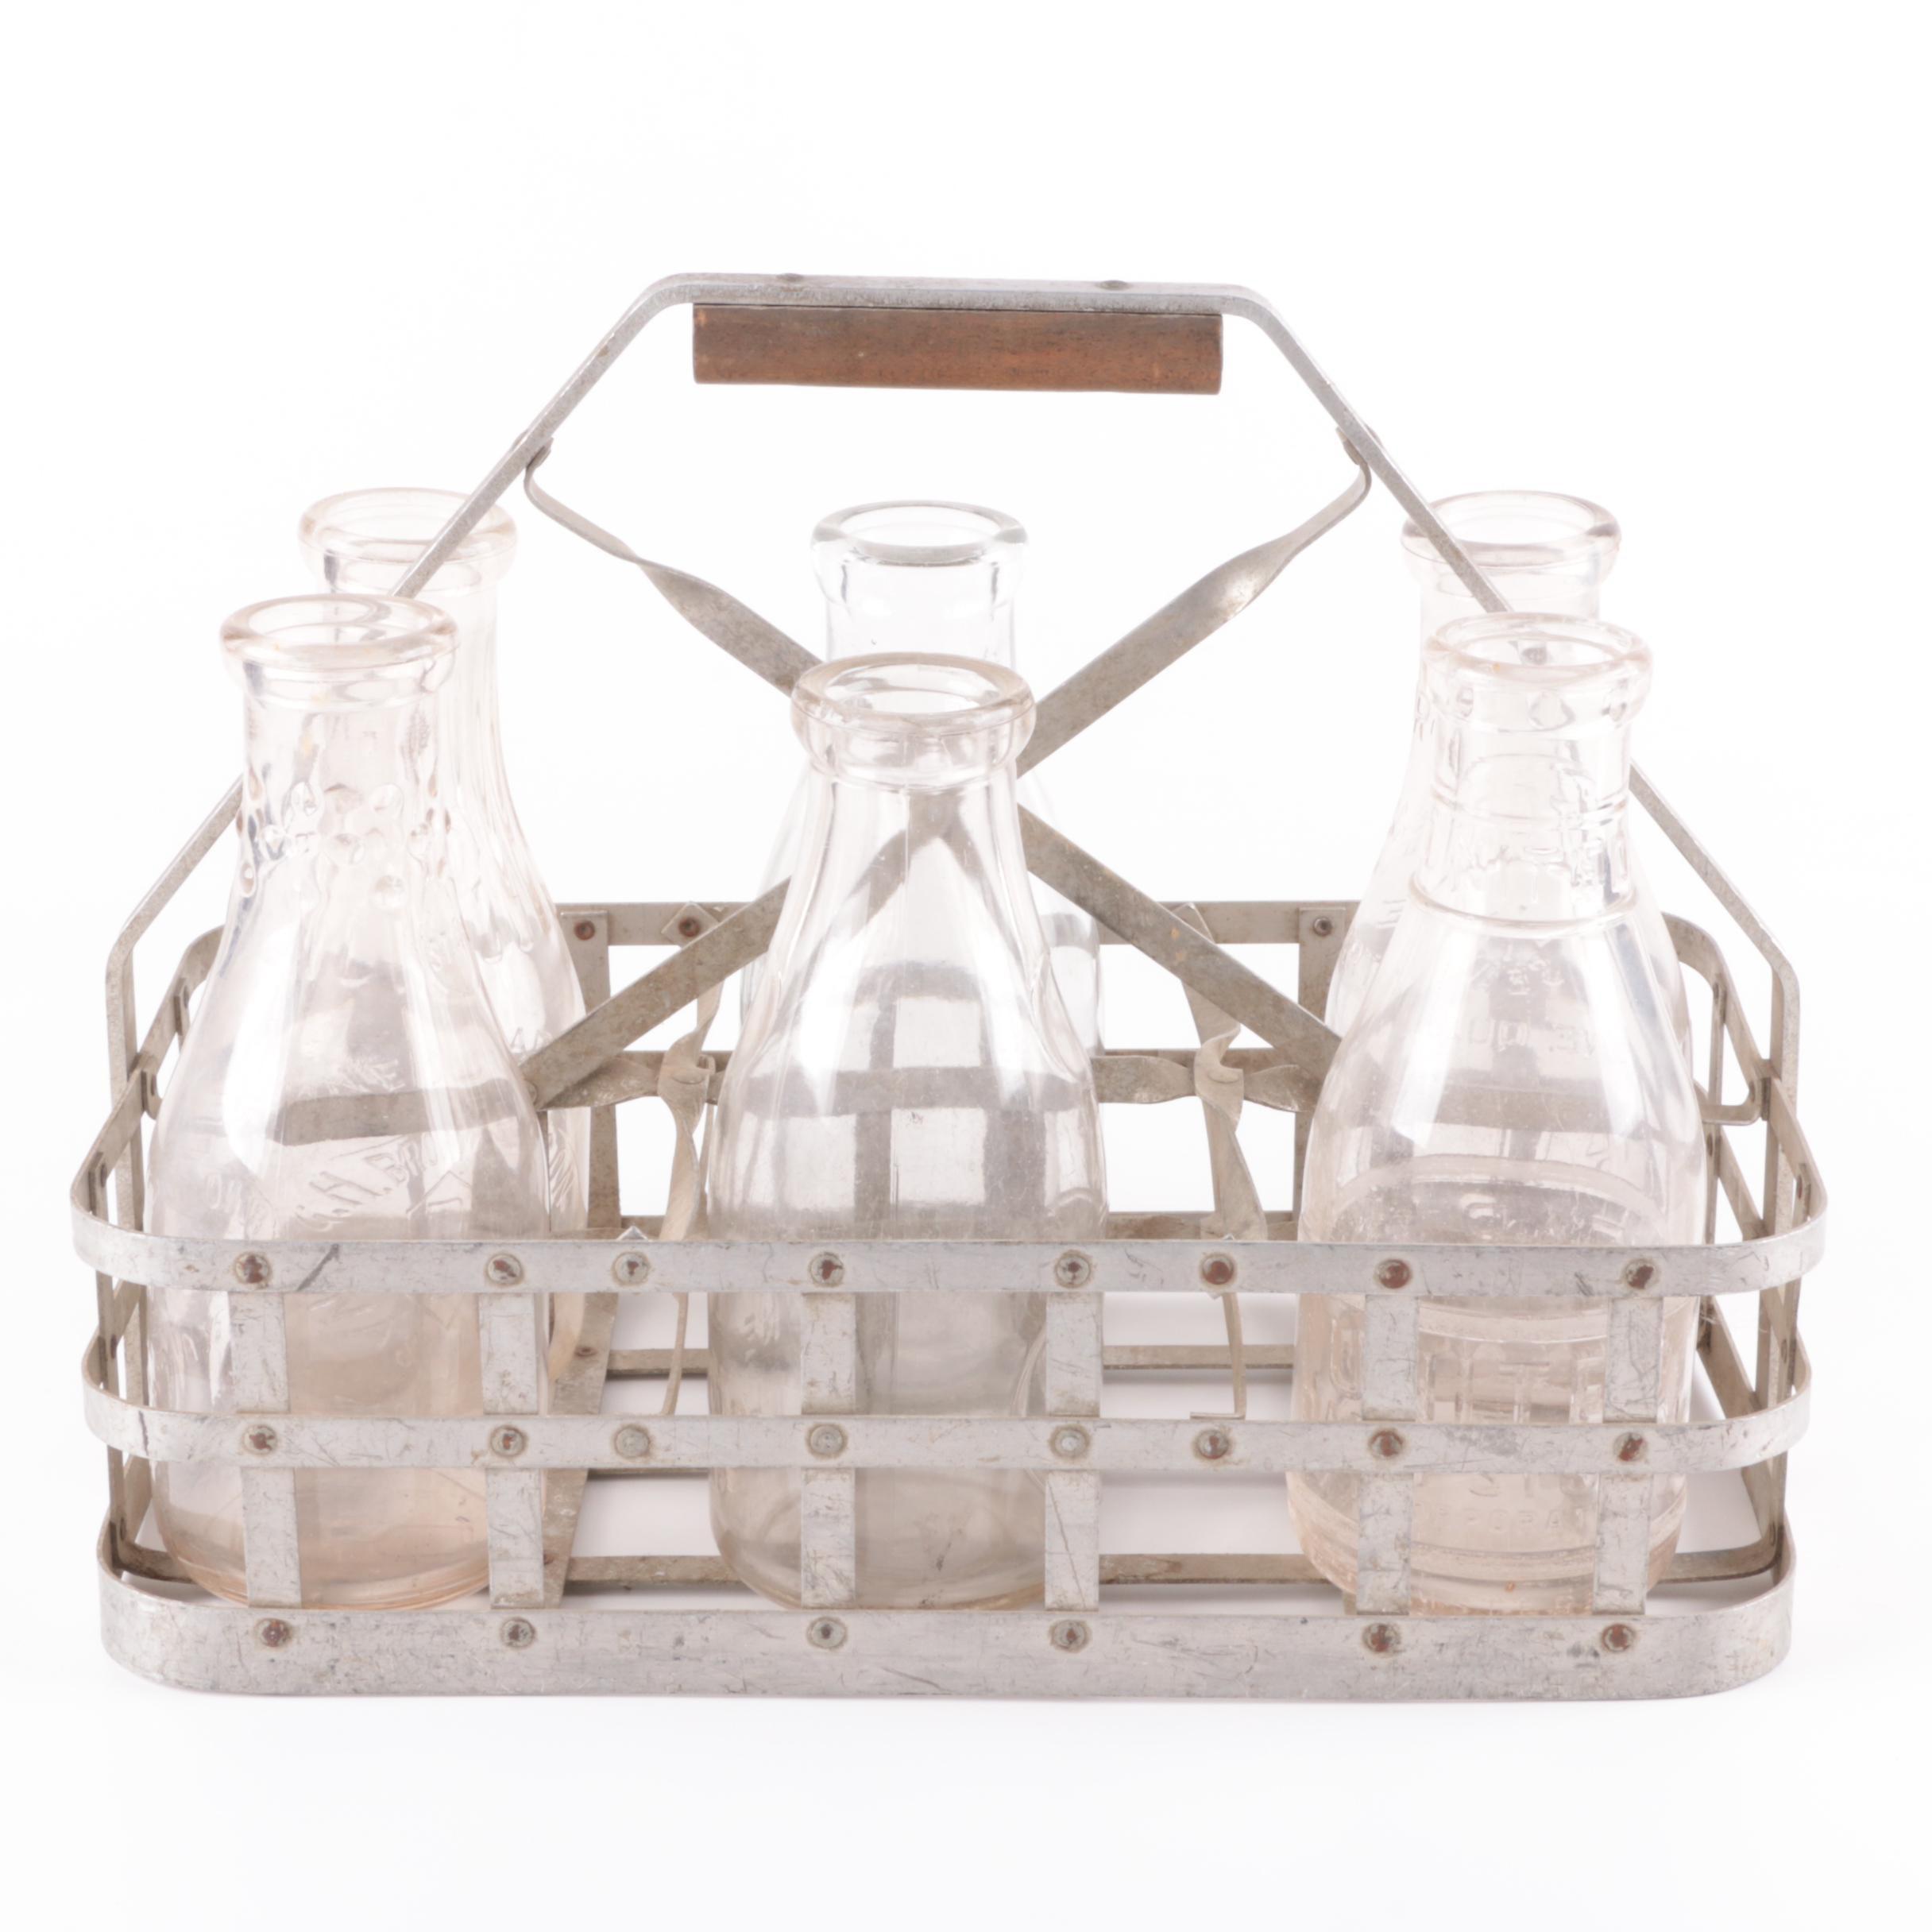 Vintage Glass Milk Bottles with Metal Carrier